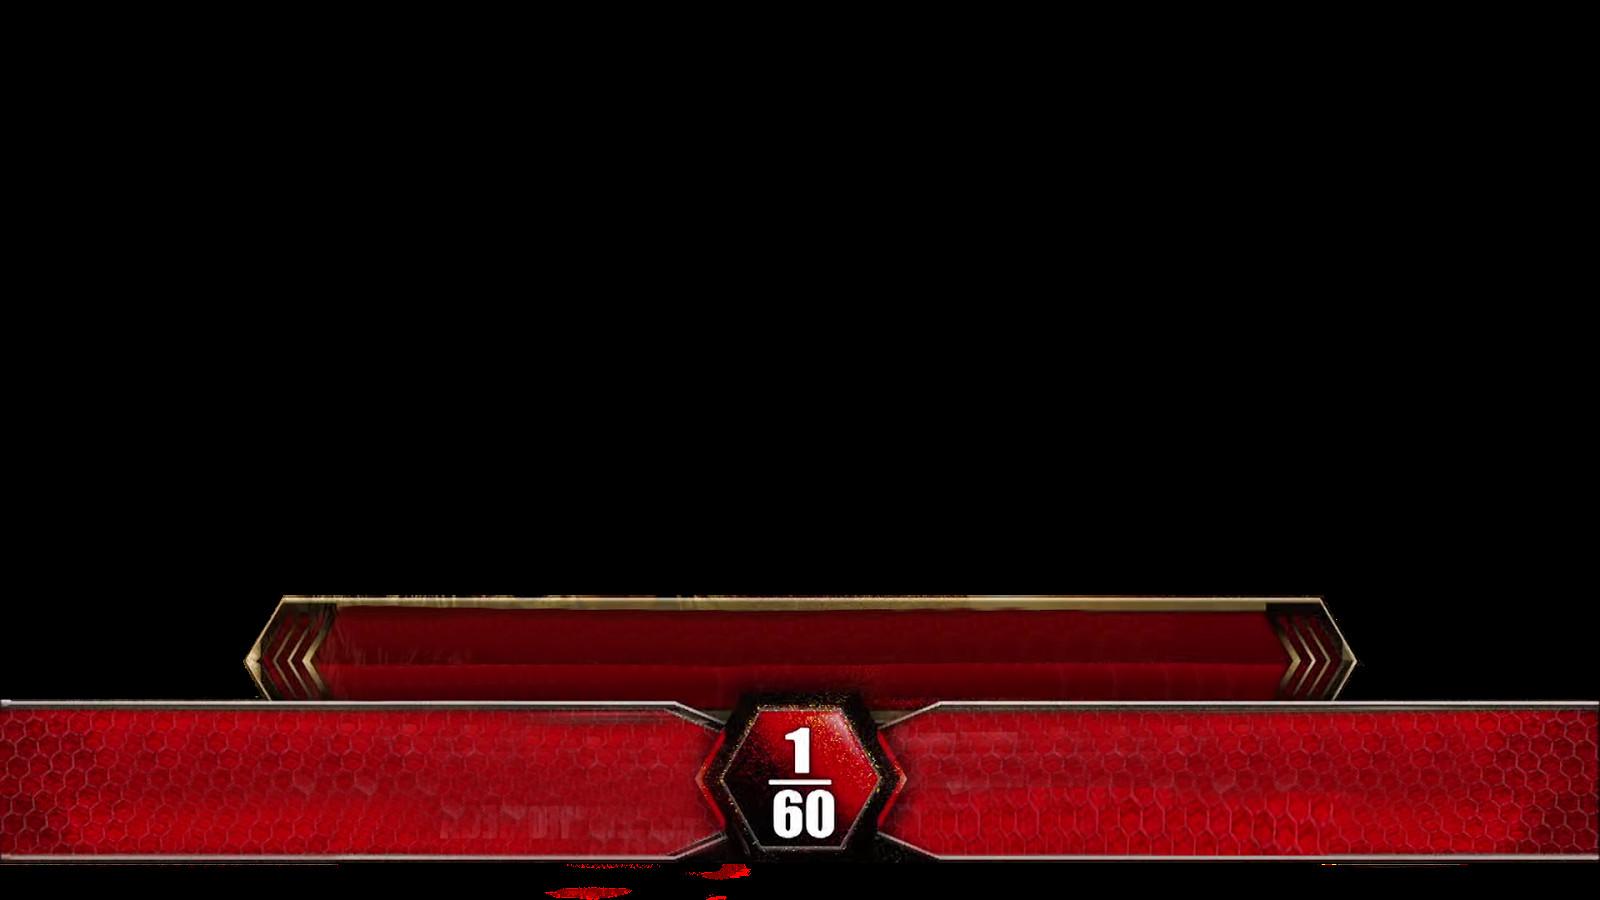 Raw Match Card Template Renders Backgrounds Logos Njpw Wrestle Kingdom 11 Match Card